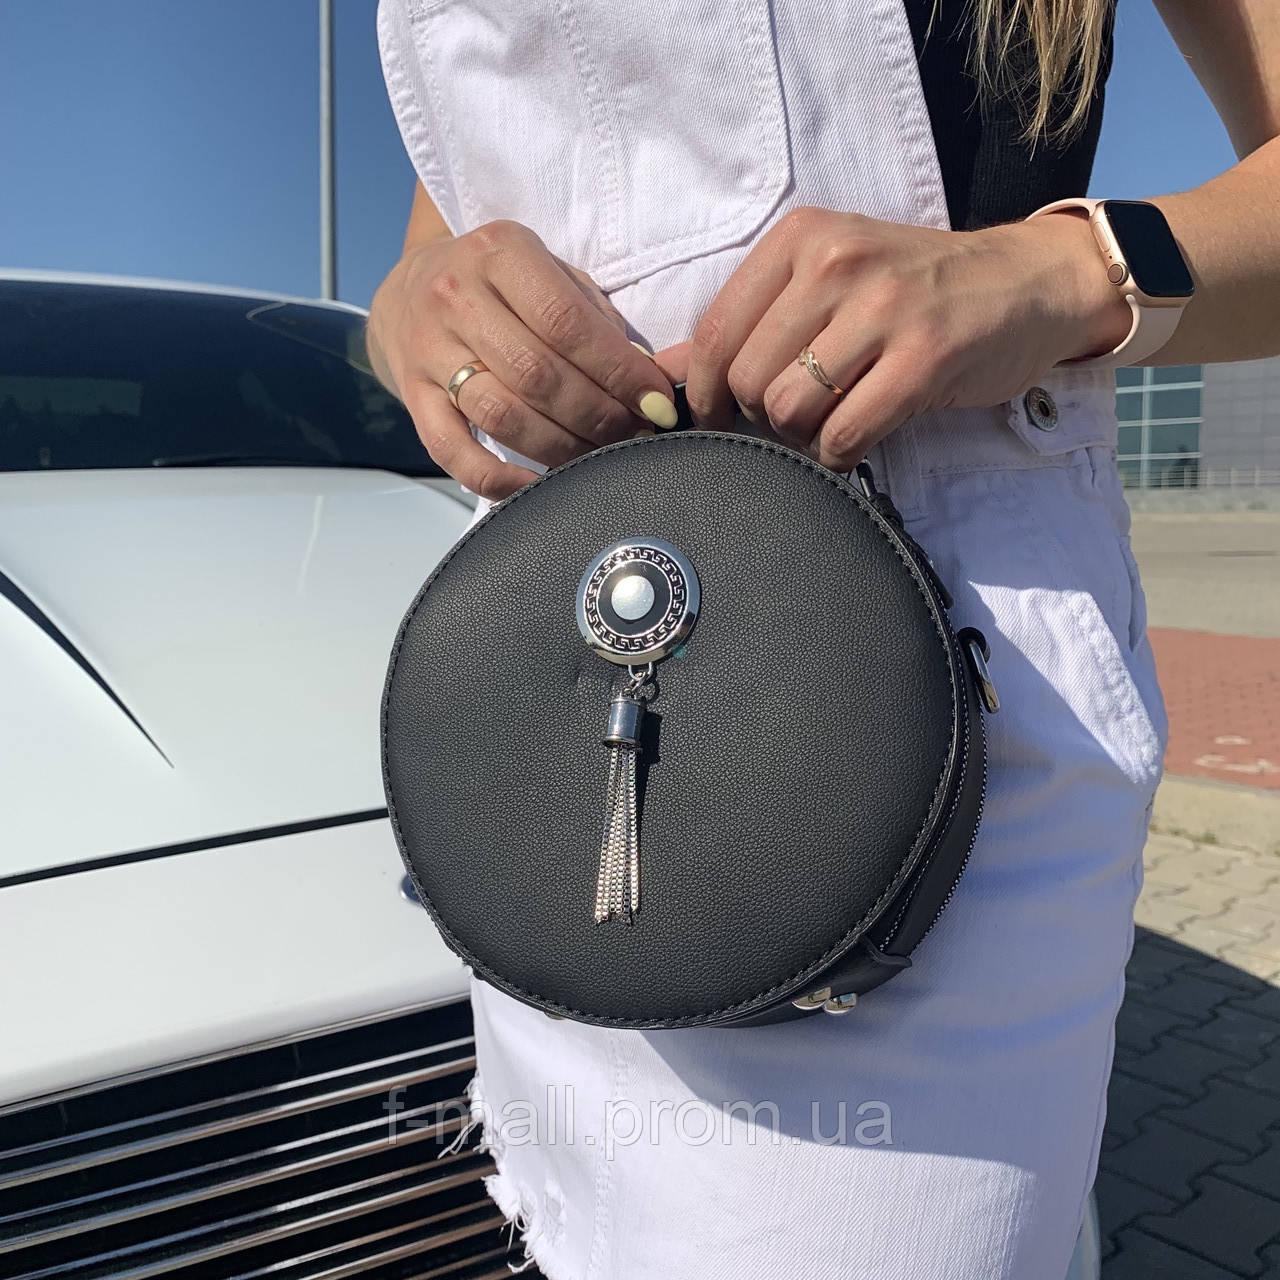 Женская сумка круглая черная (1158)